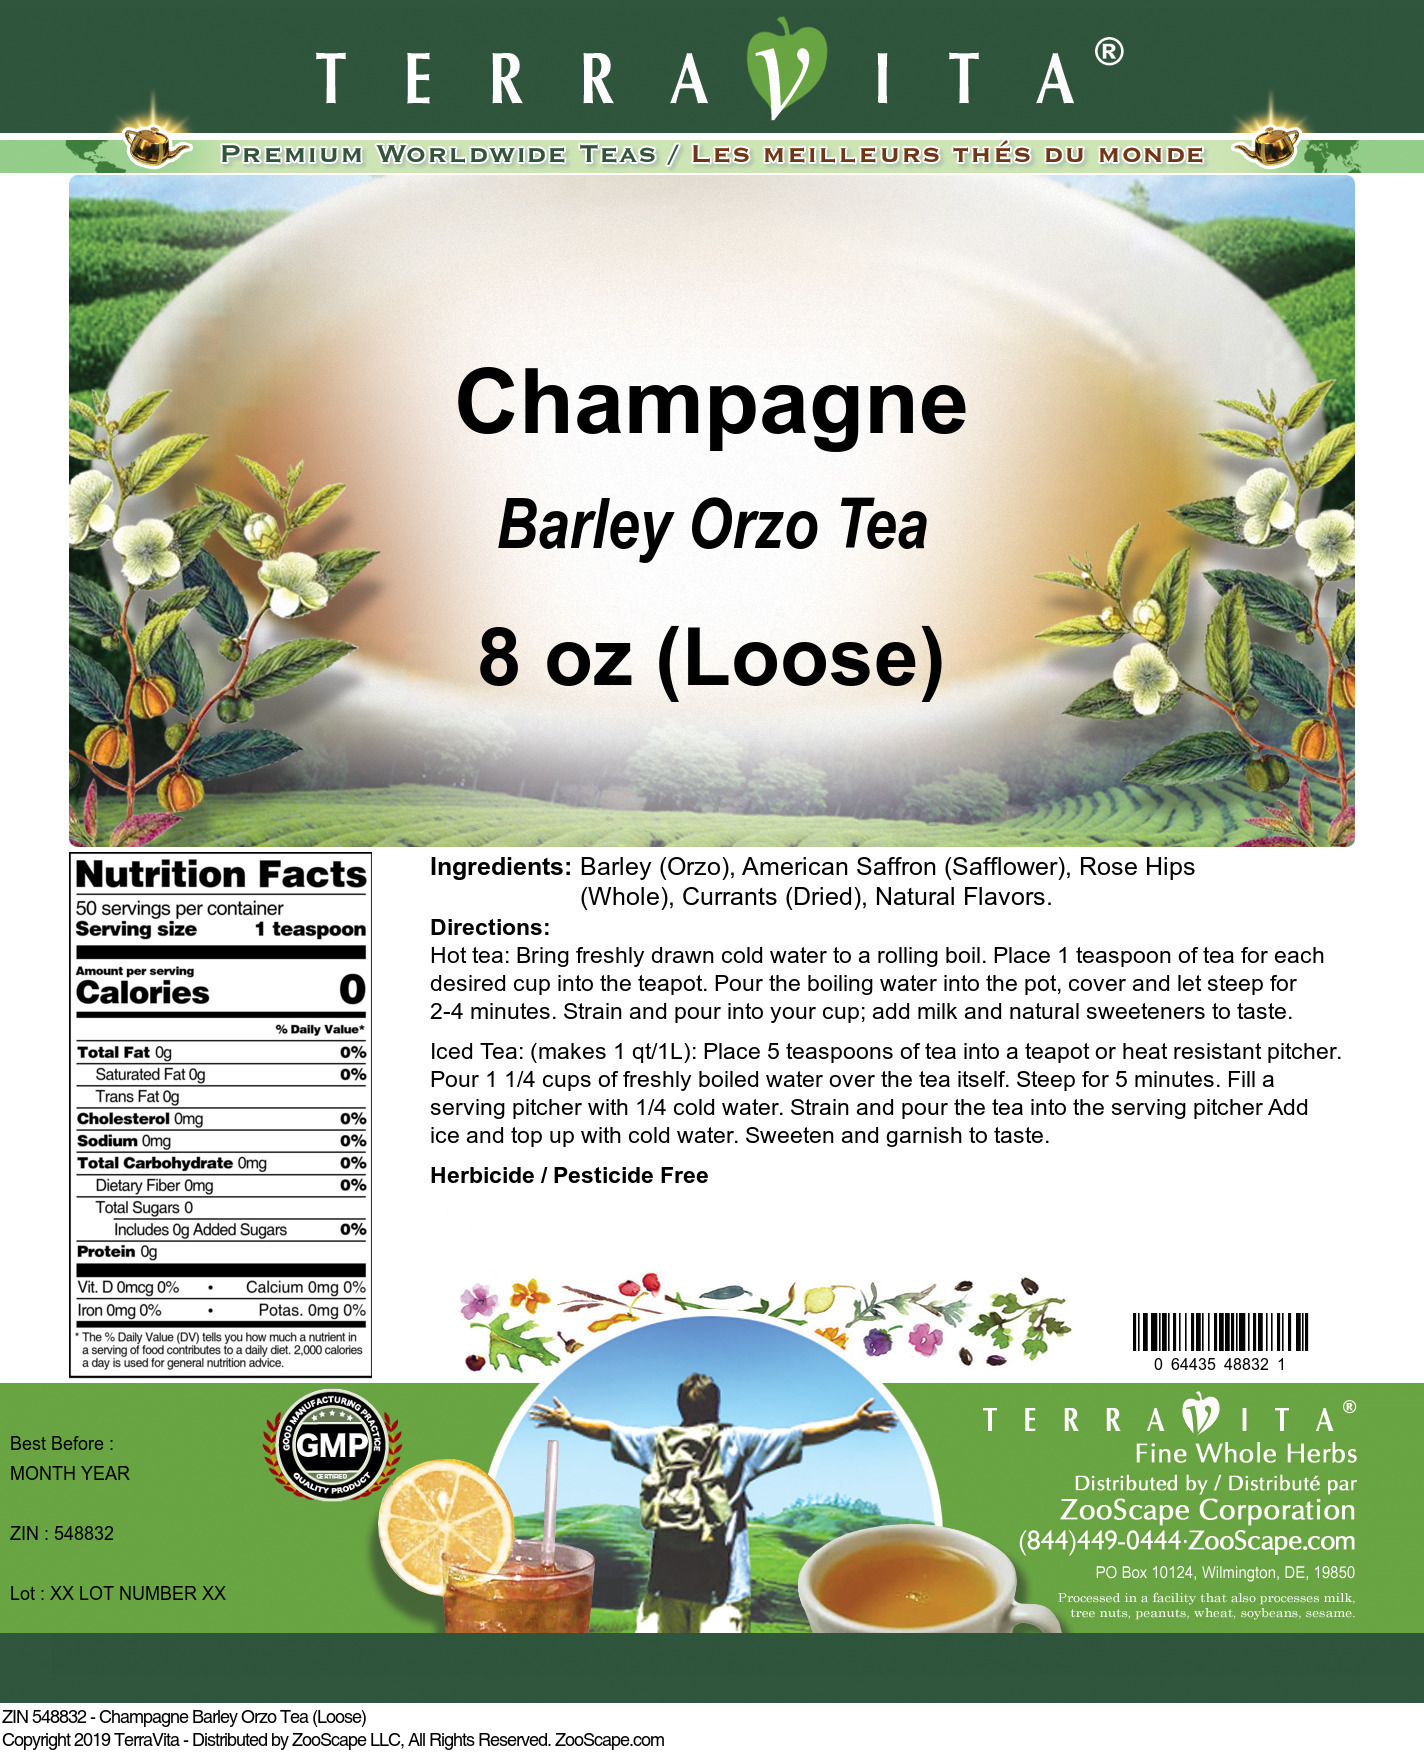 Champagne Barley Orzo Tea (Loose)